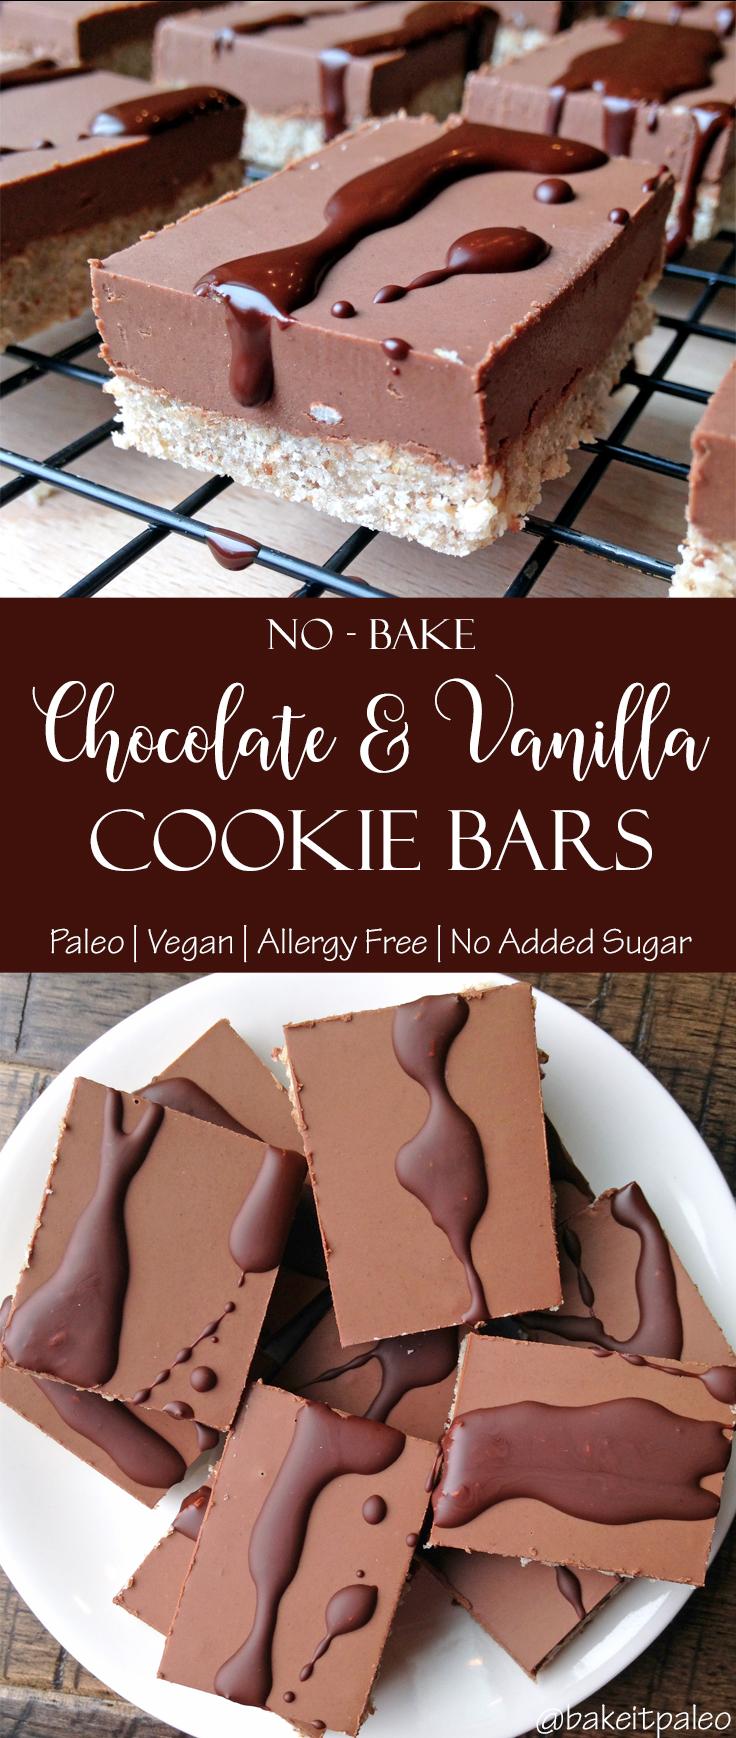 No Bake Chocolate and Vanilla Paleo Cookie Bars